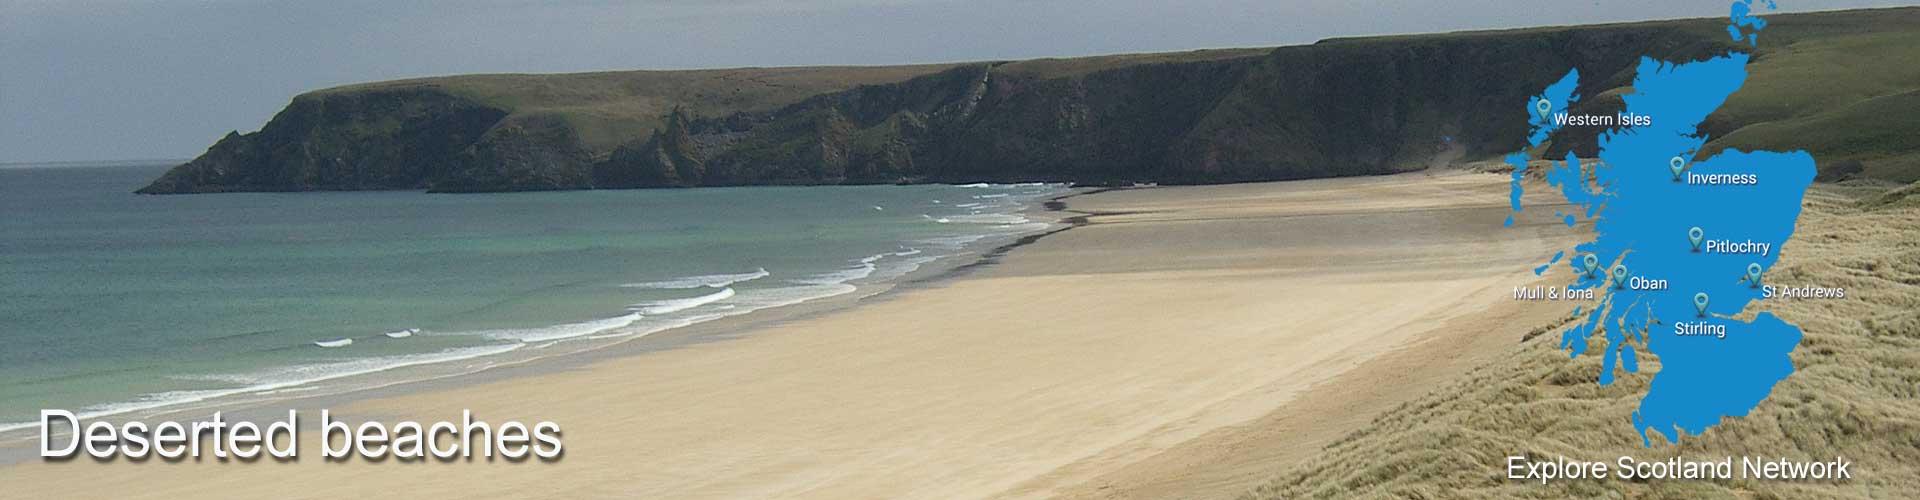 Isle of Lewis beaches